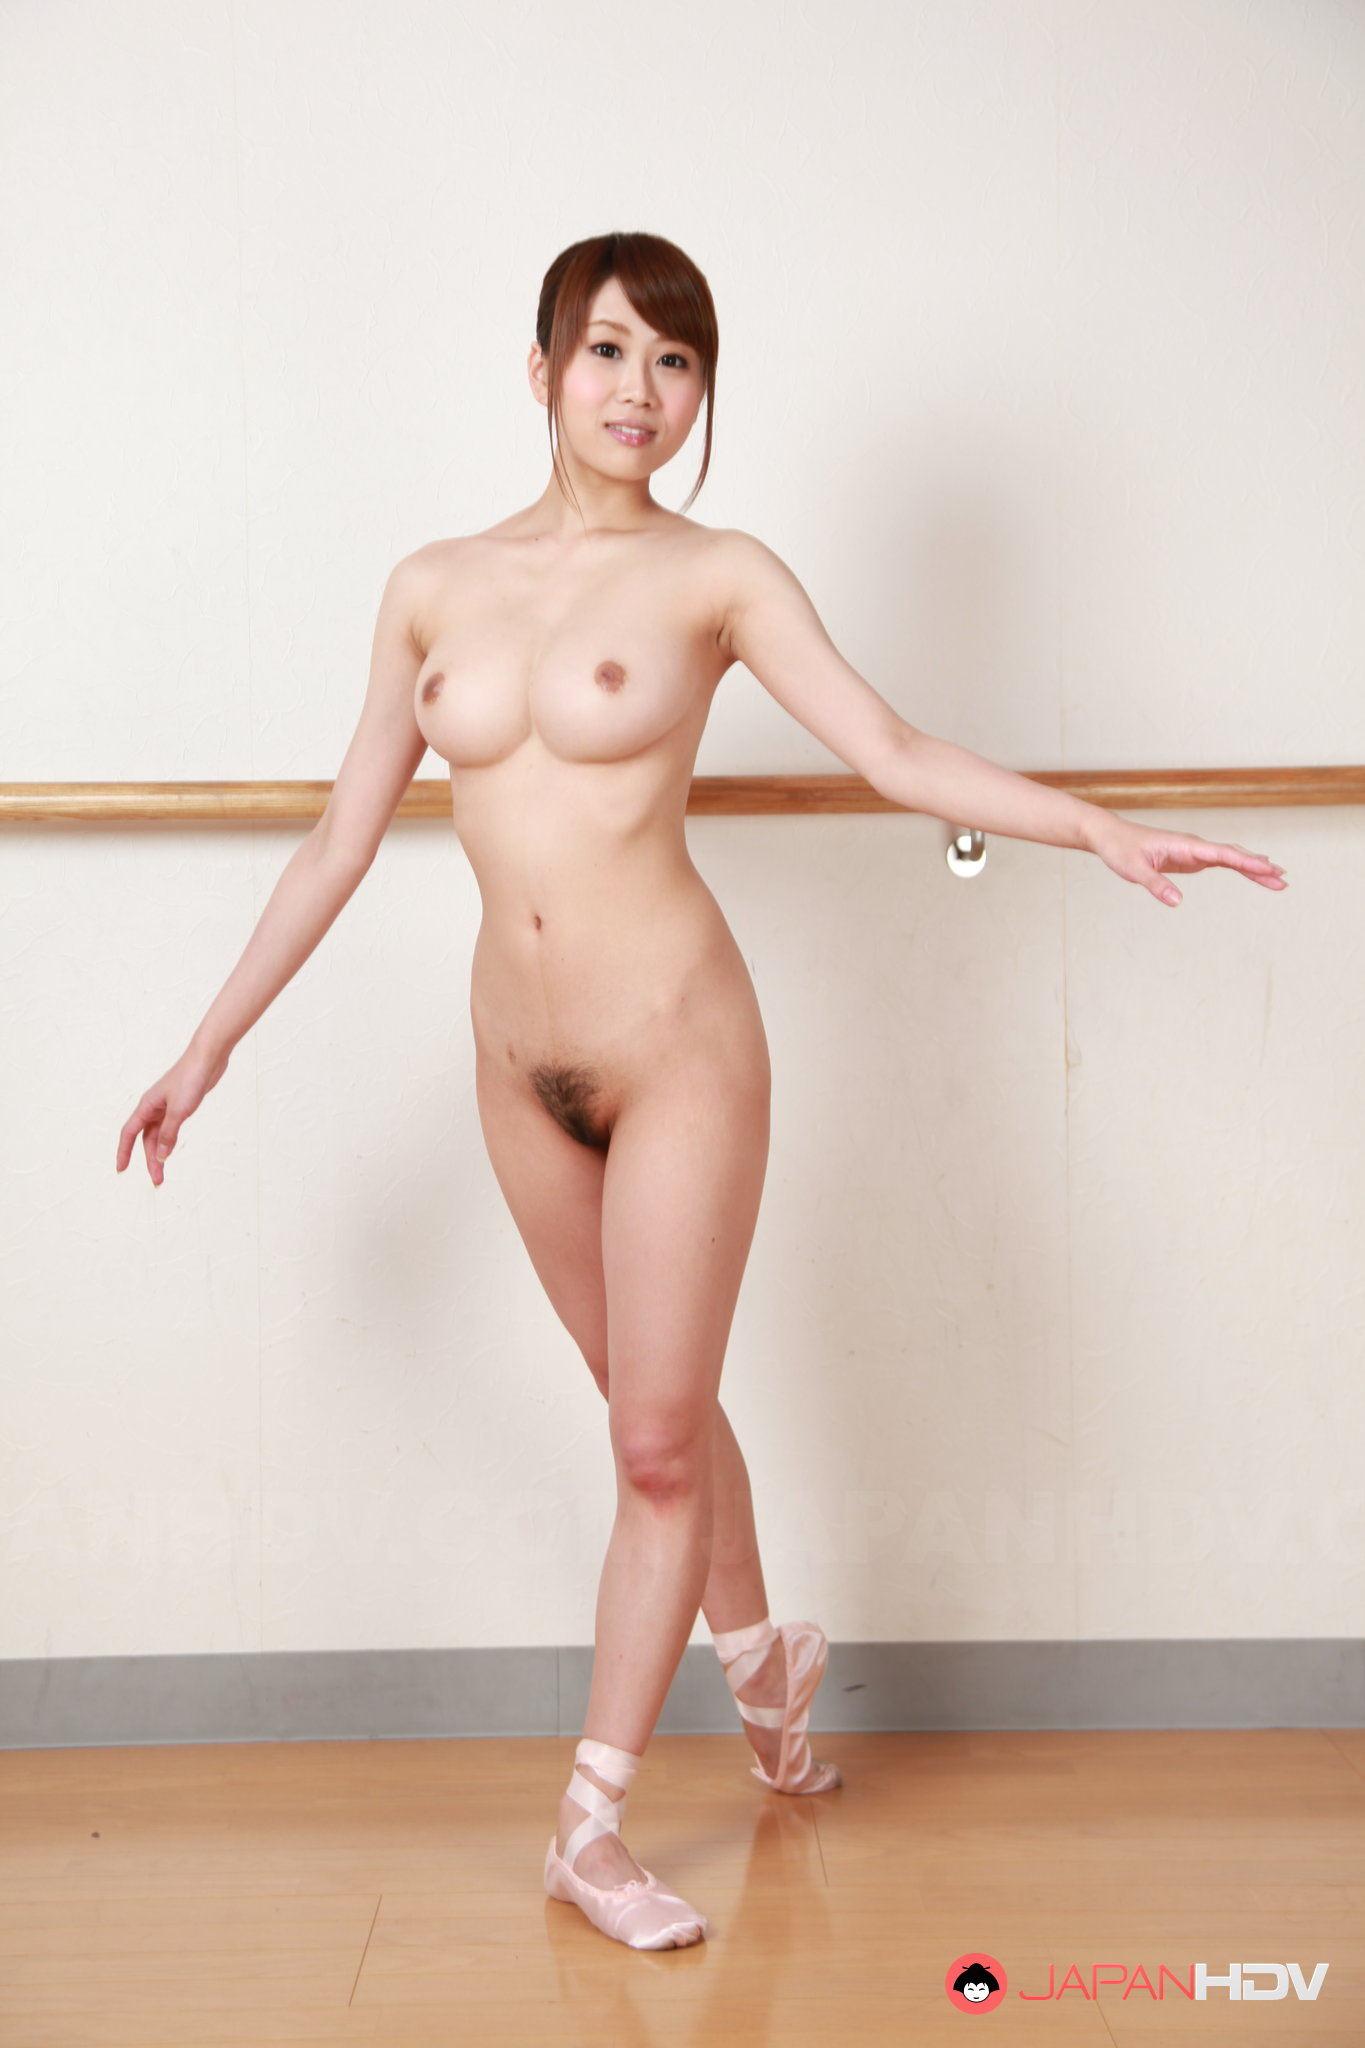 in japan female topless